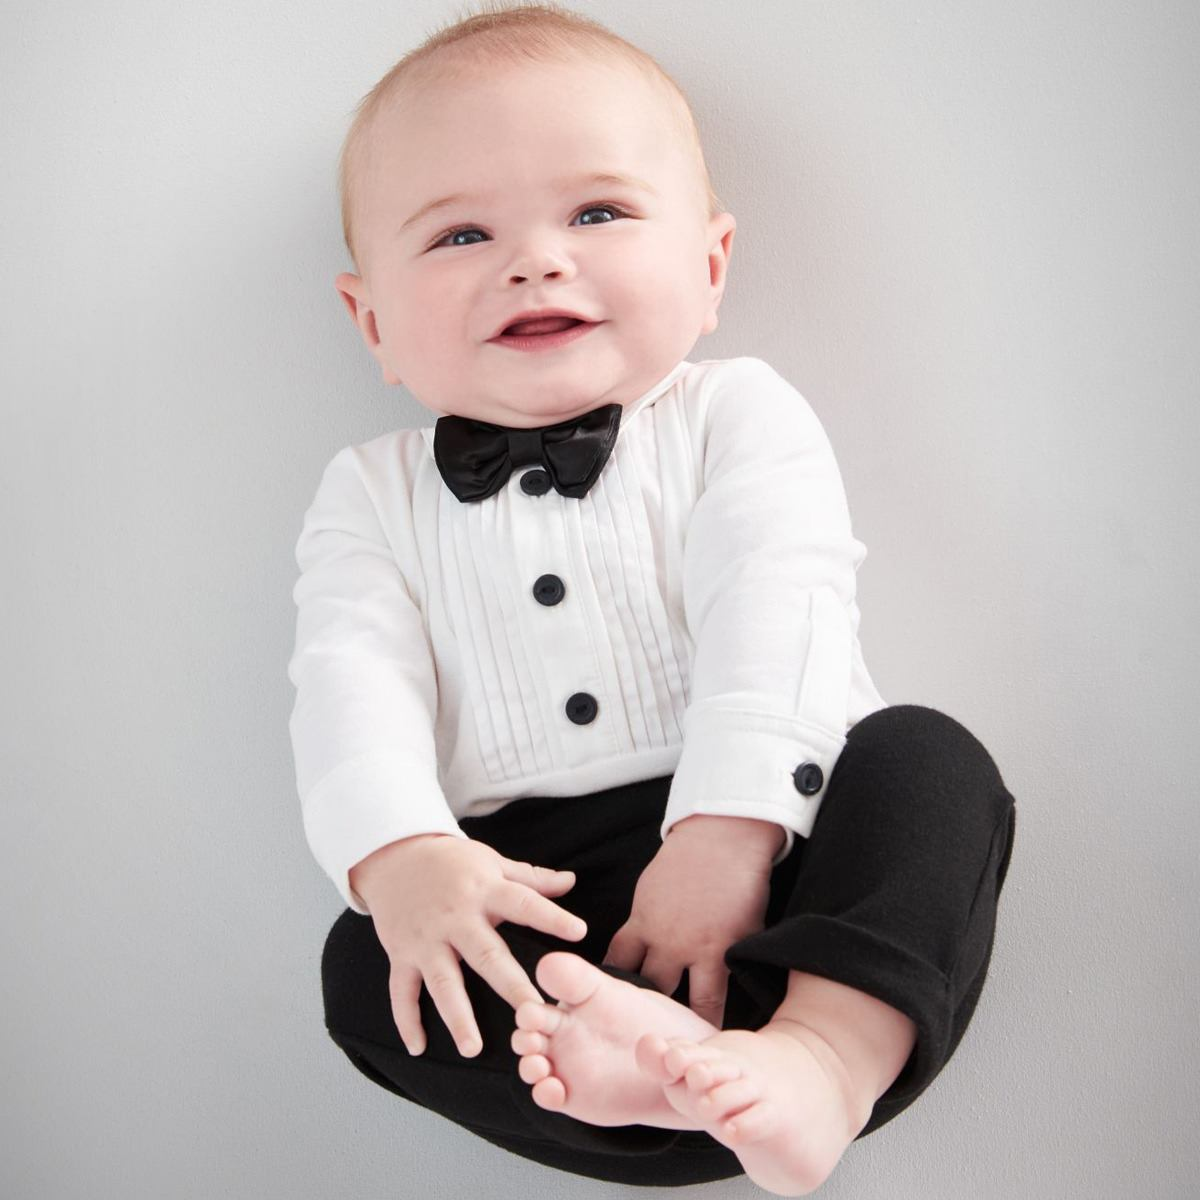 Babykleding Voor Kerst.Baby Feestkleding Kerst Kerst 2018